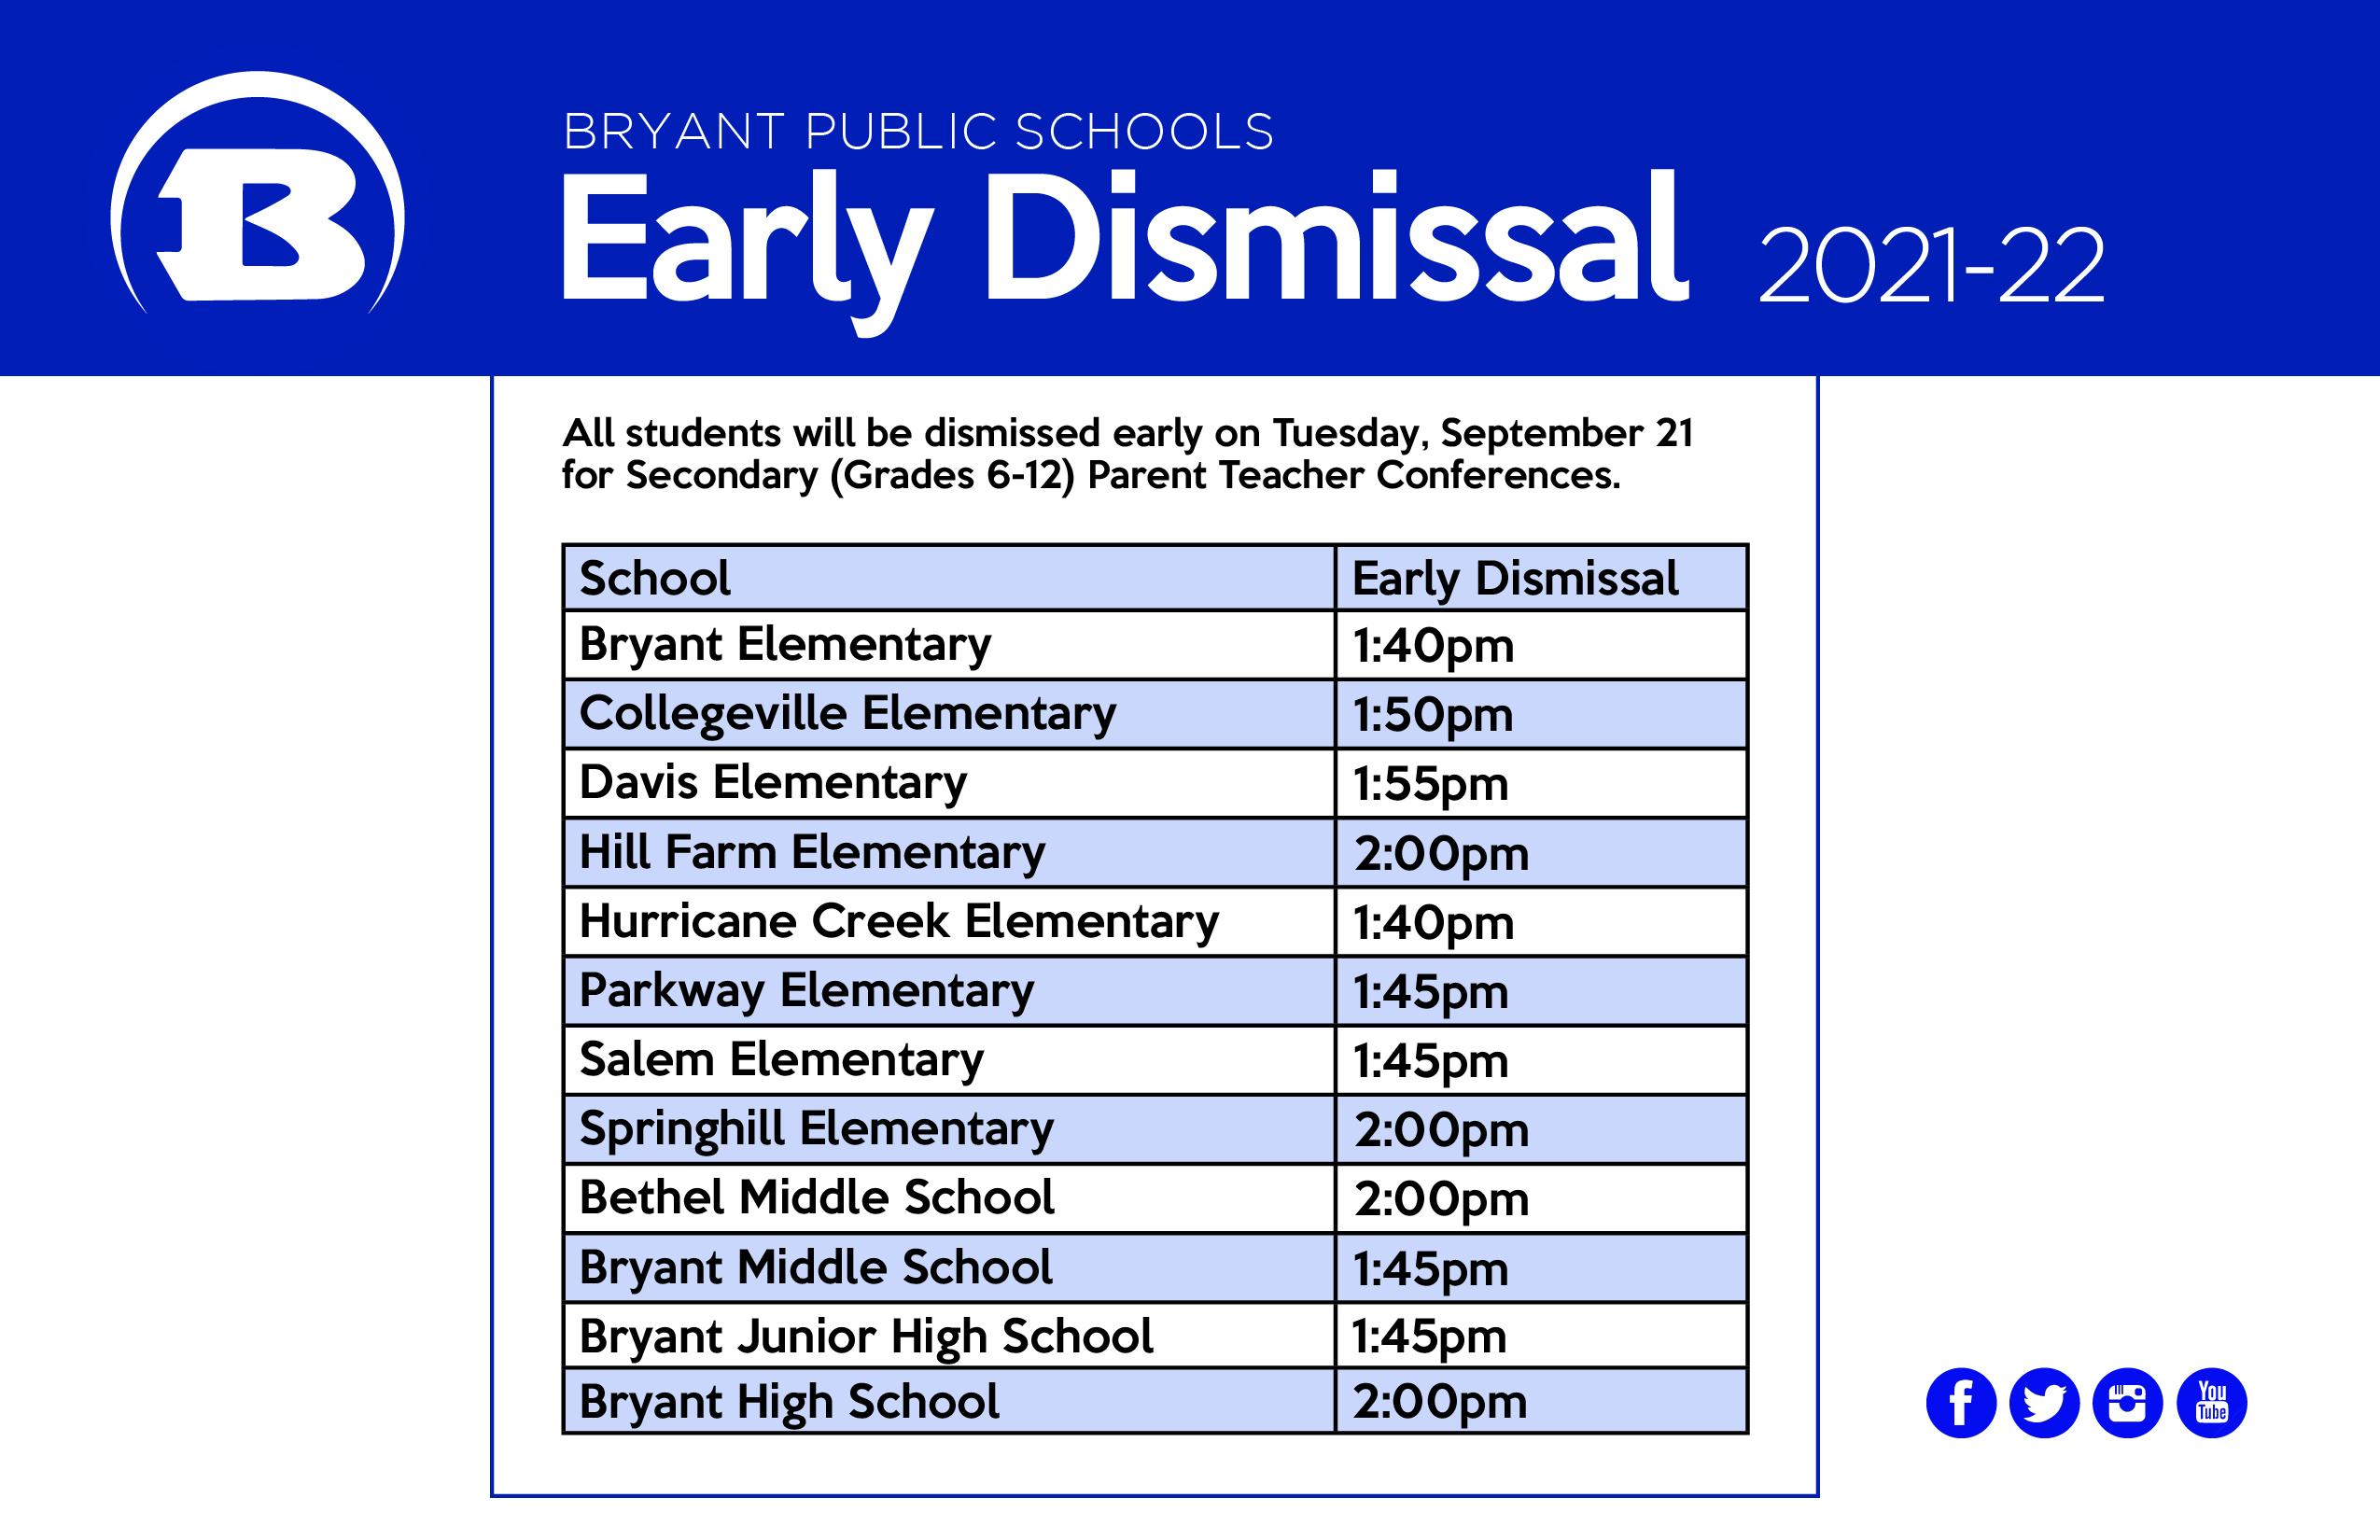 parent teacher conferences/early dismissal schedule